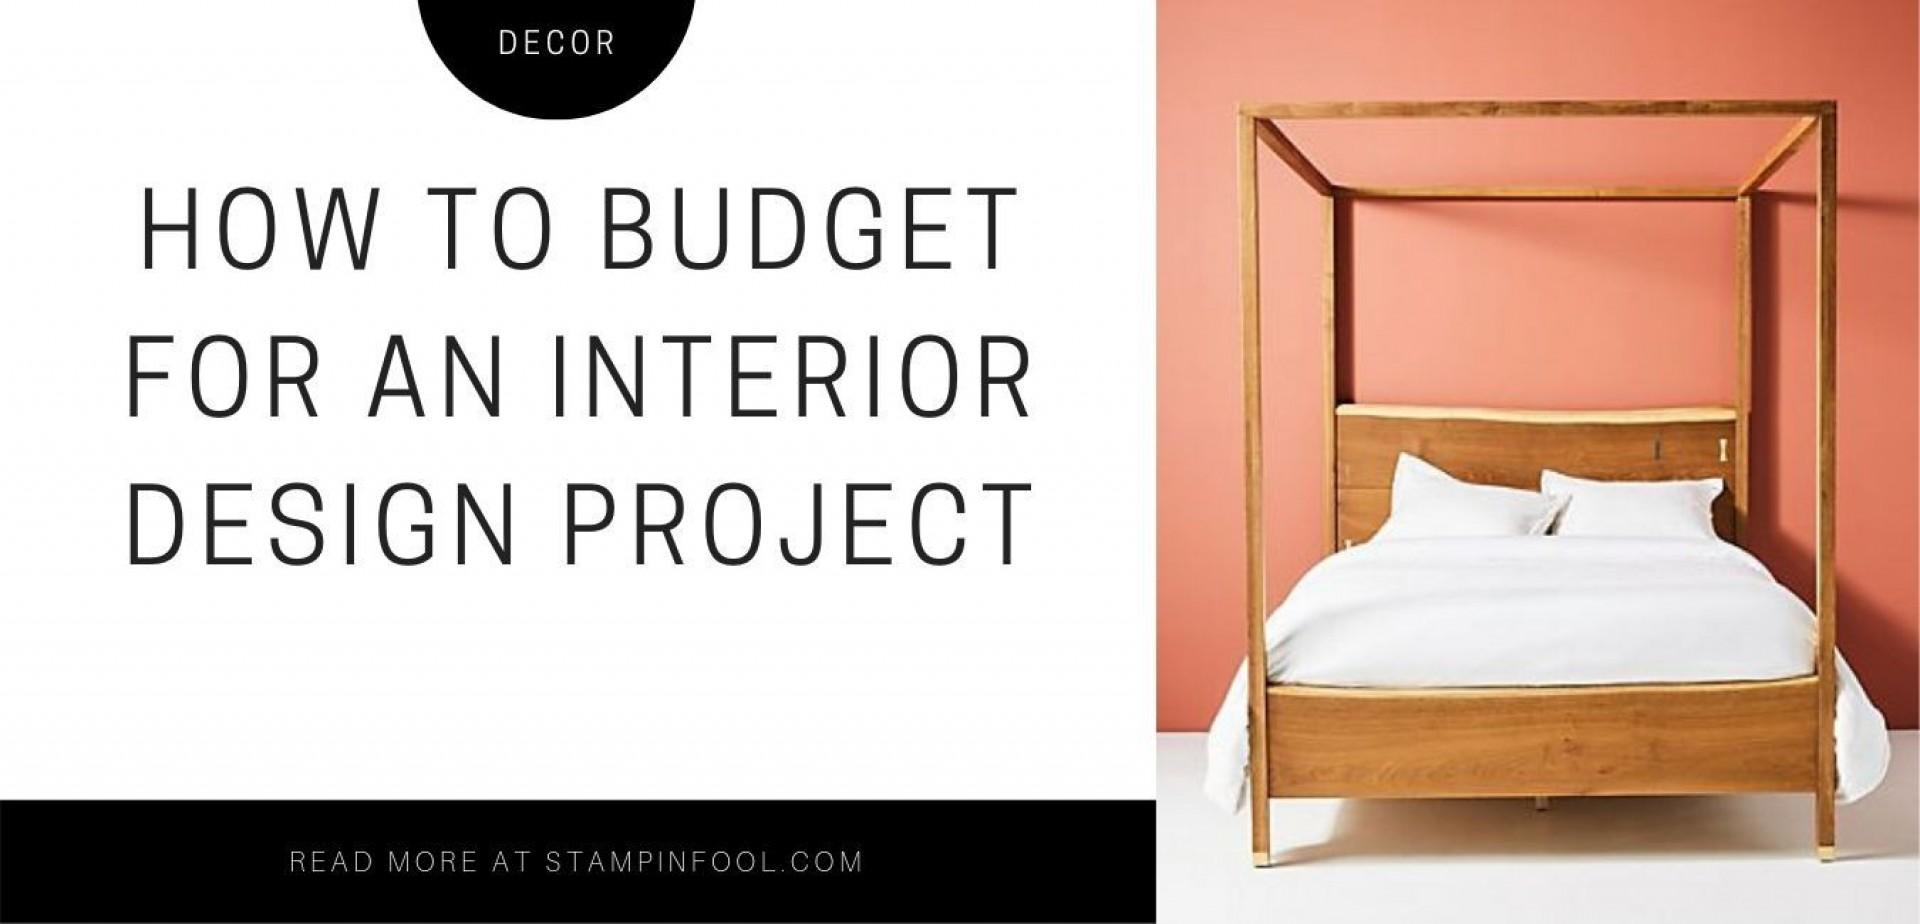 003 Excellent Free Home Remodel Budget Template Inspiration  Renovation Excel Uk Best1920